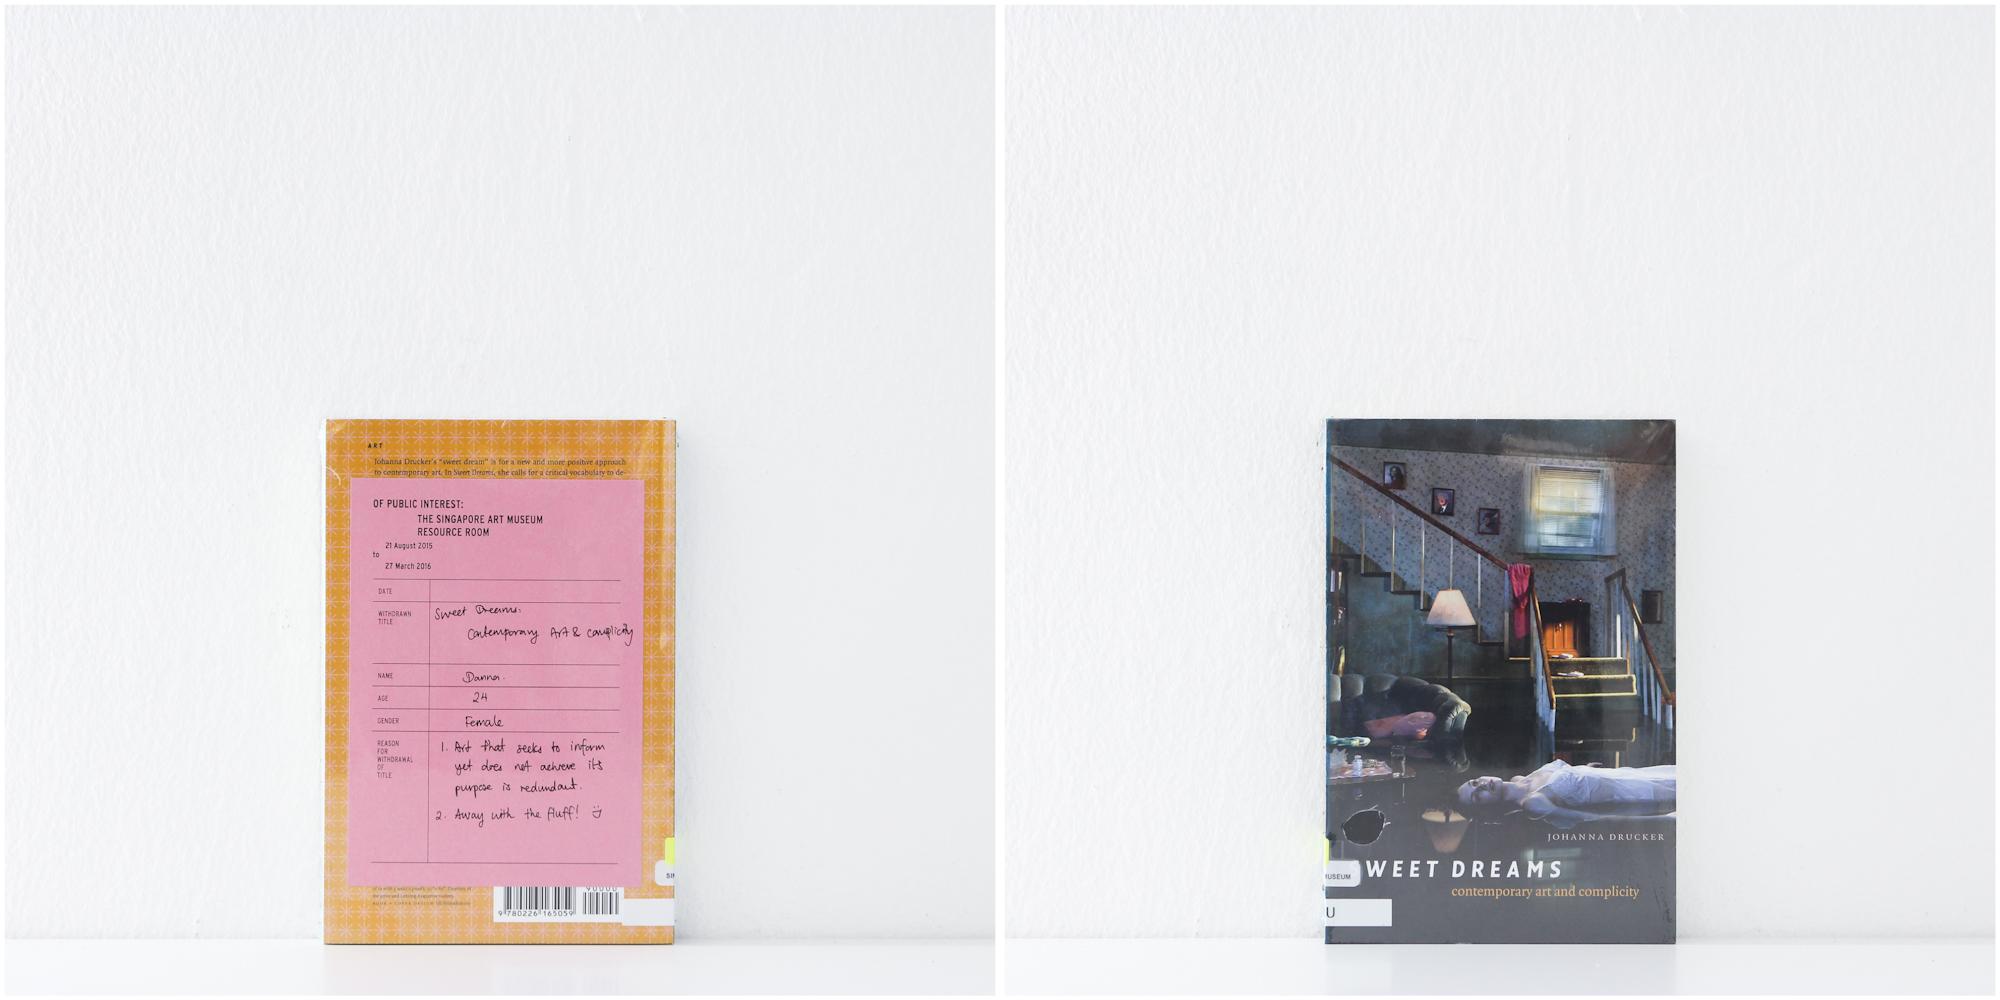 'Sweet Dreams: Contemporary Art & Complicity', no date, Danna, 24, Female